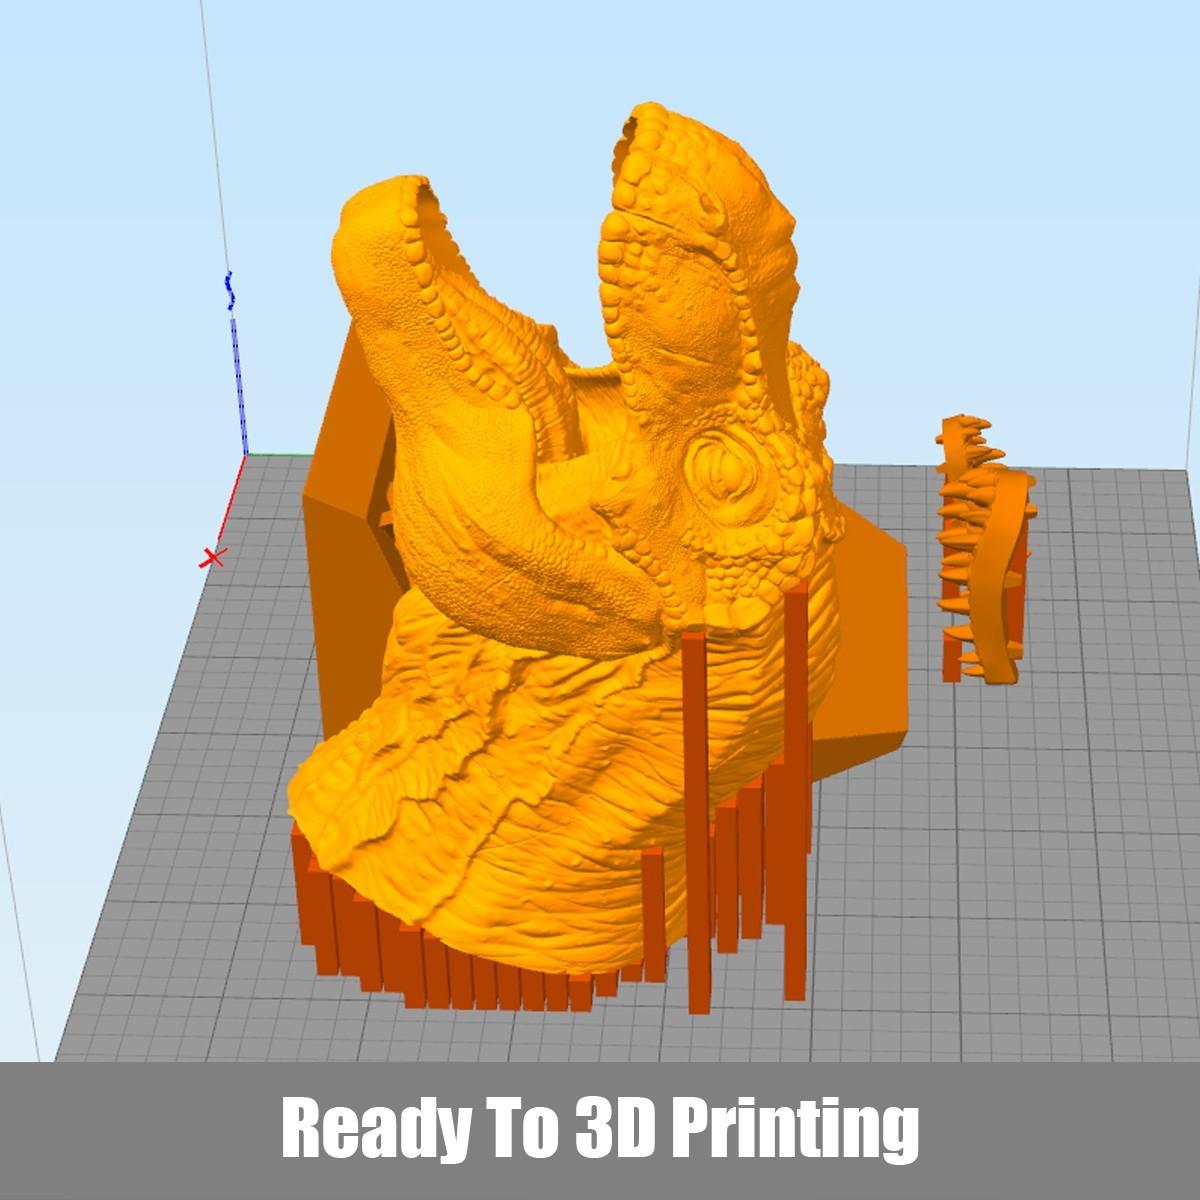 P01.jpg Download OBJ file T-rex Tyrannosaurus • 3D printable object, Dynastinae